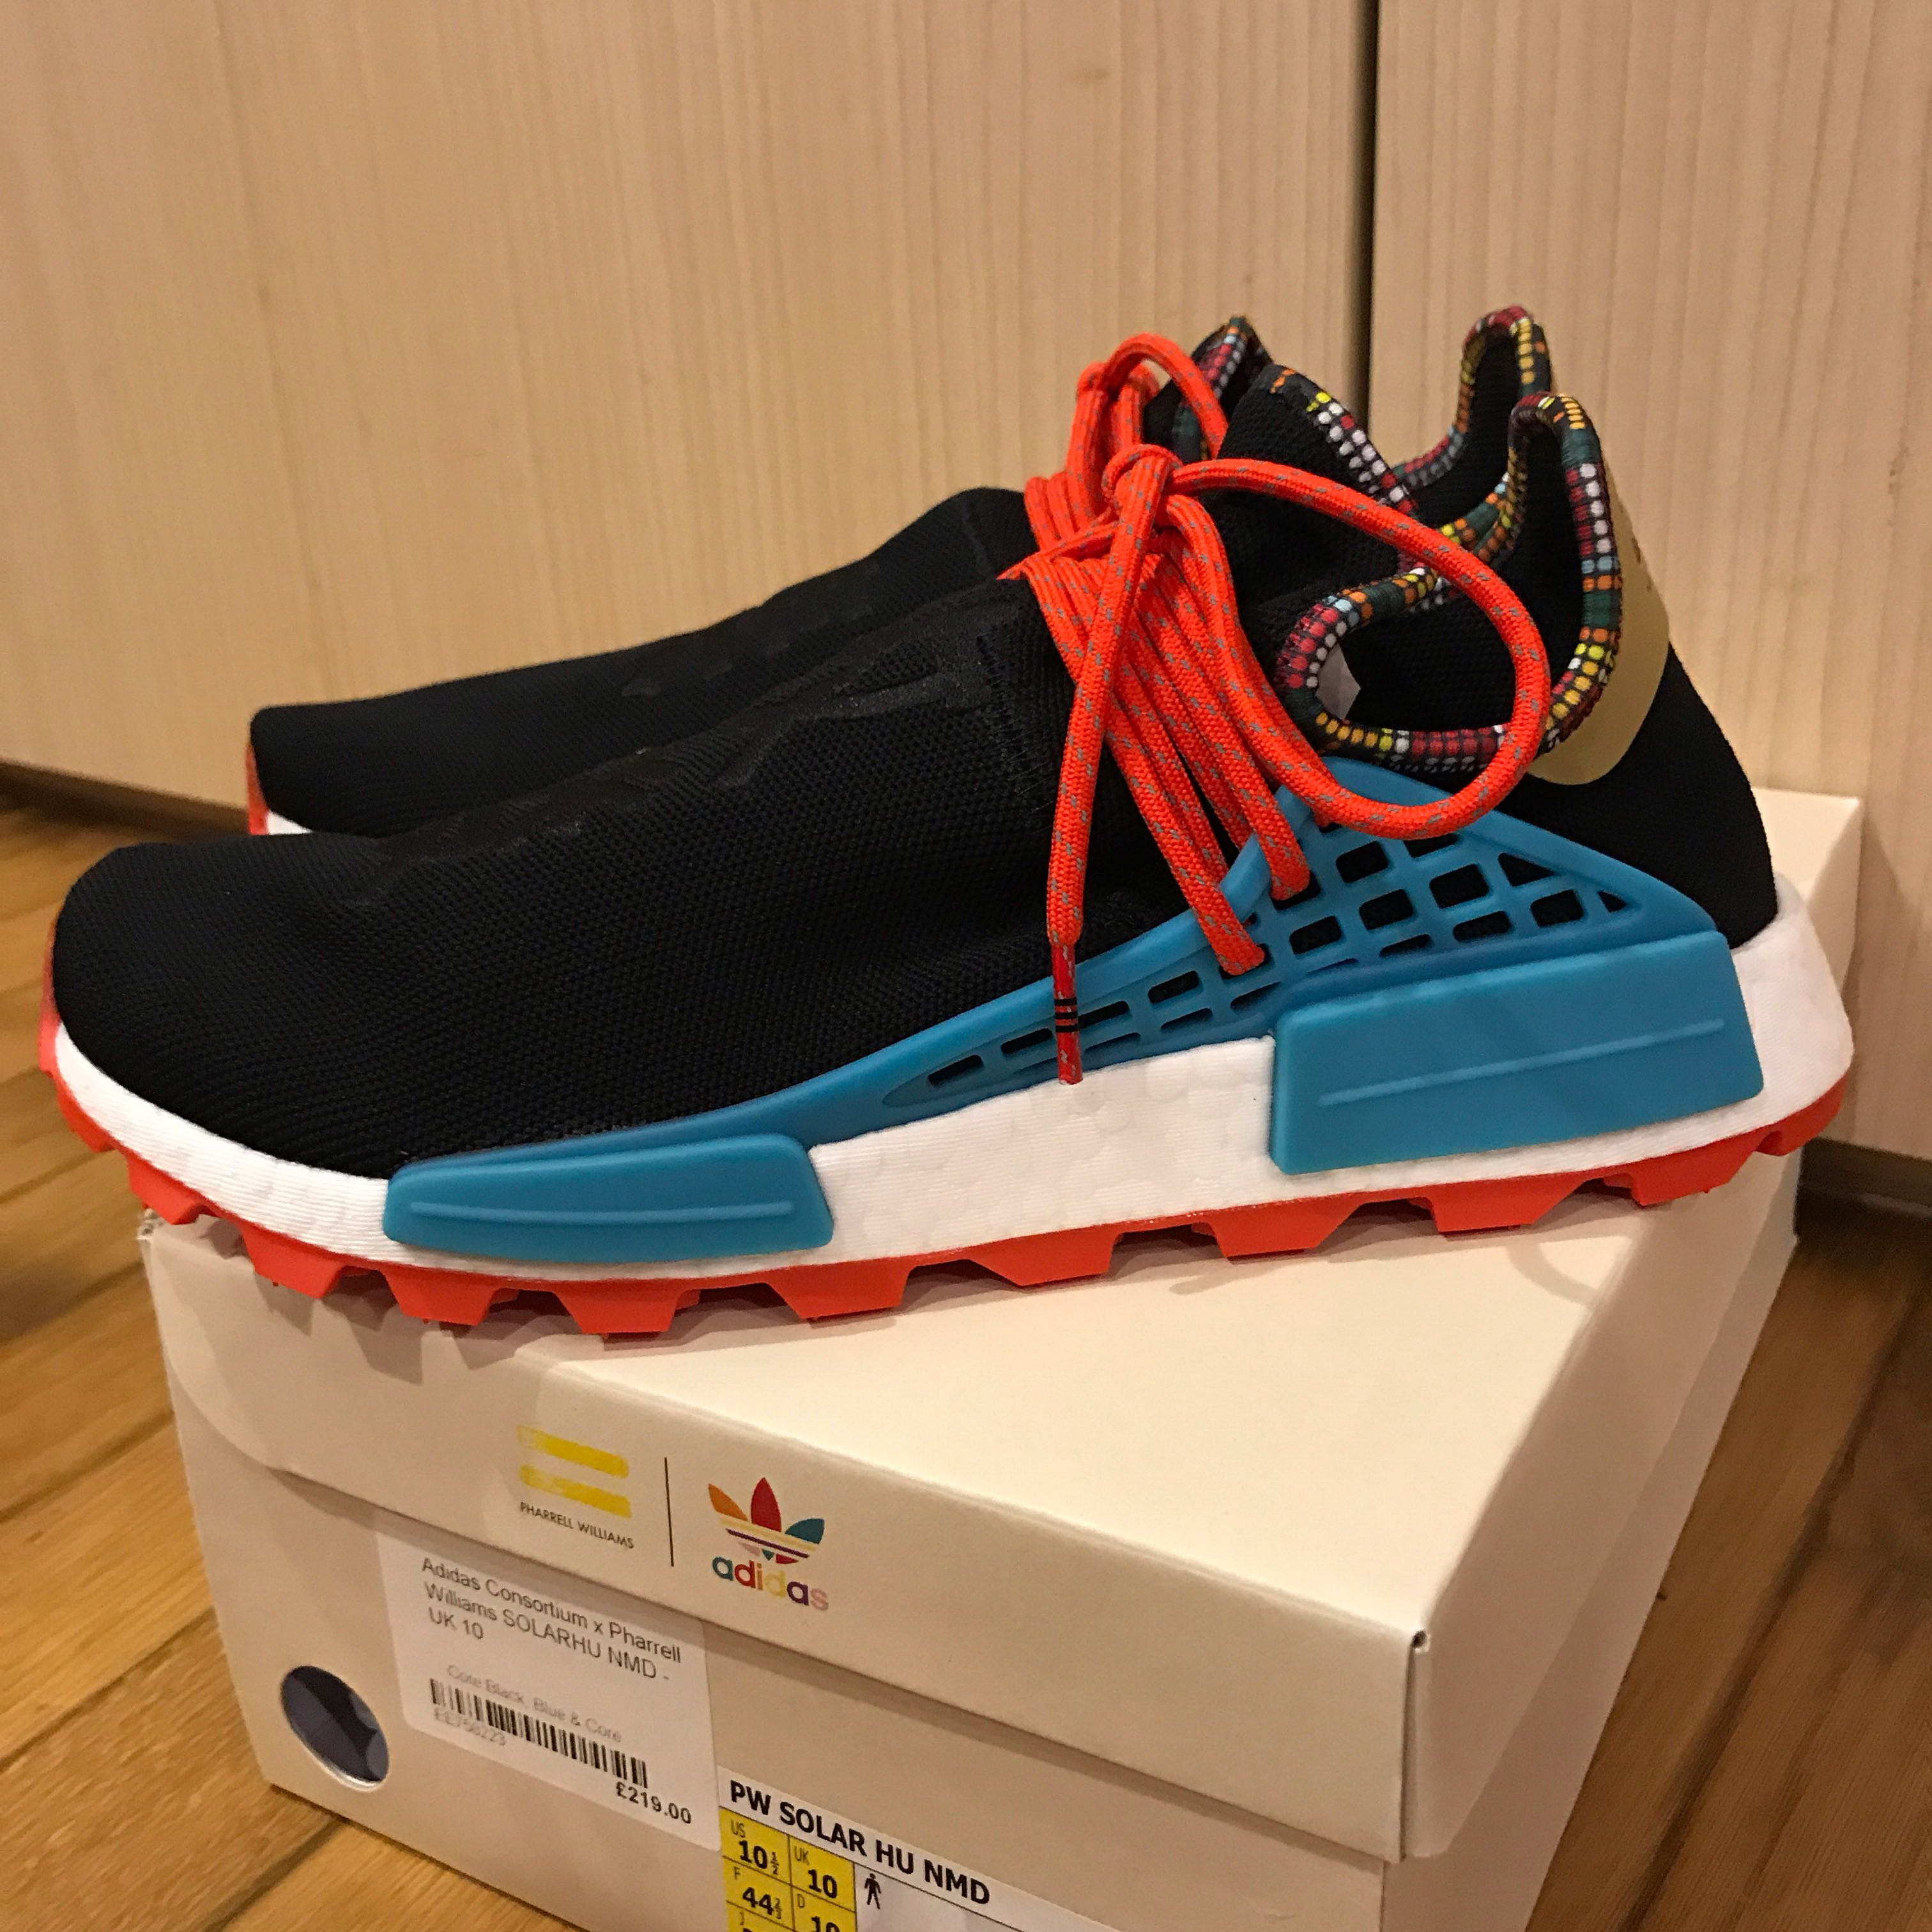 71d6c4bfa Adidas human race nmd - Pharrell Williams